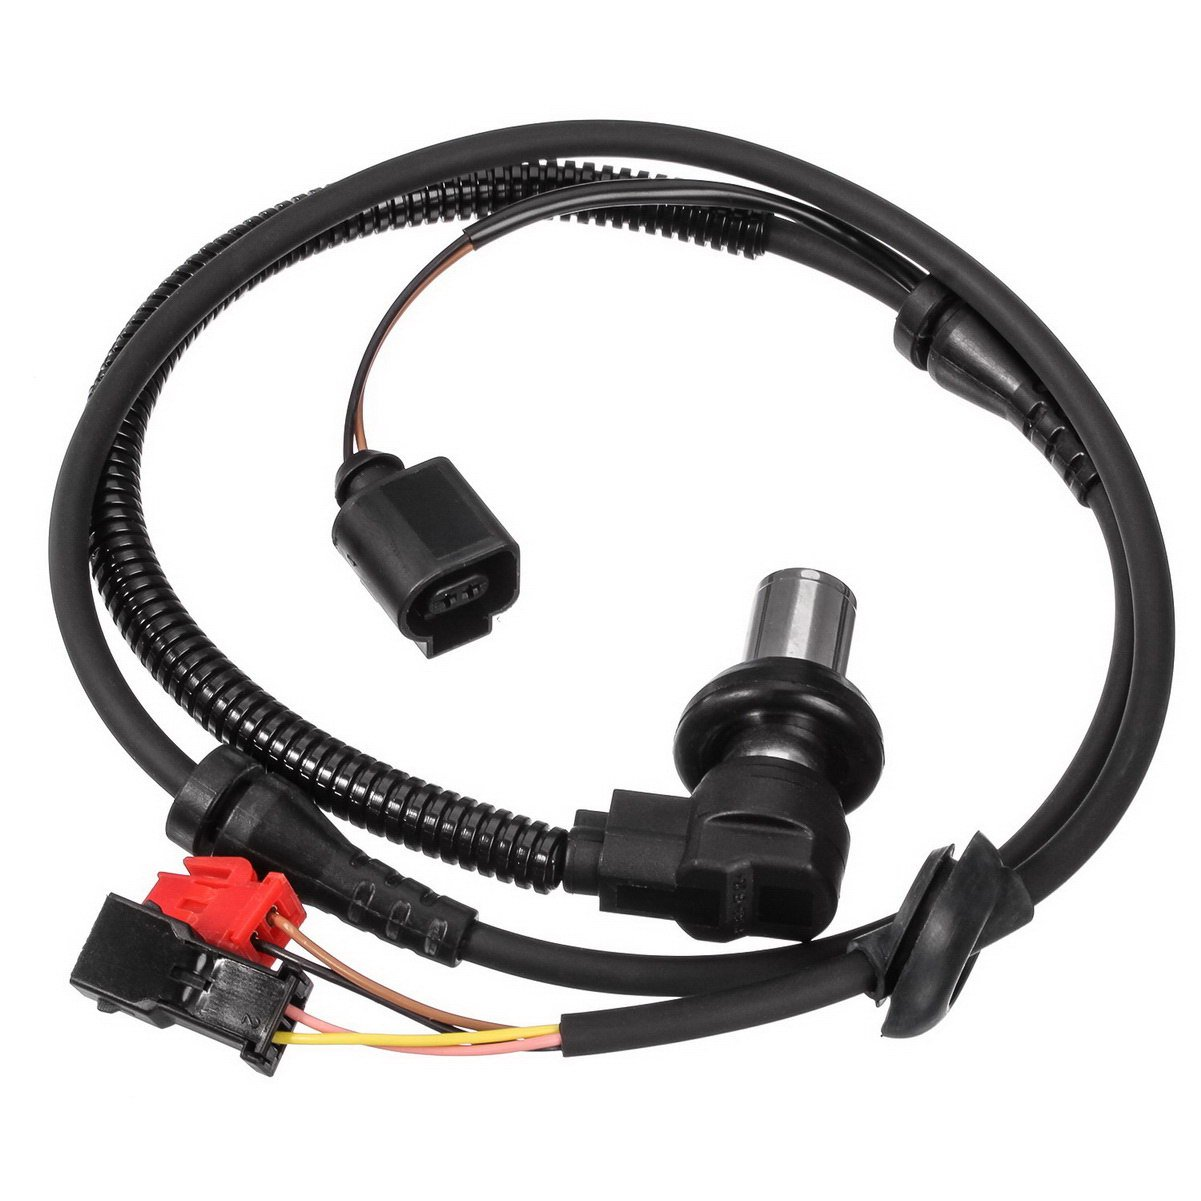 AUTEX ABS Wheel Speed Sensor 4B0927803C 8D0927803D ALS424 Front Left or Right compatible w// 2000 2001 2002 2003 2004 2005 Volkswagen Passat 2000 2001 Audi A4 Audi A4 Quattro Audi S4